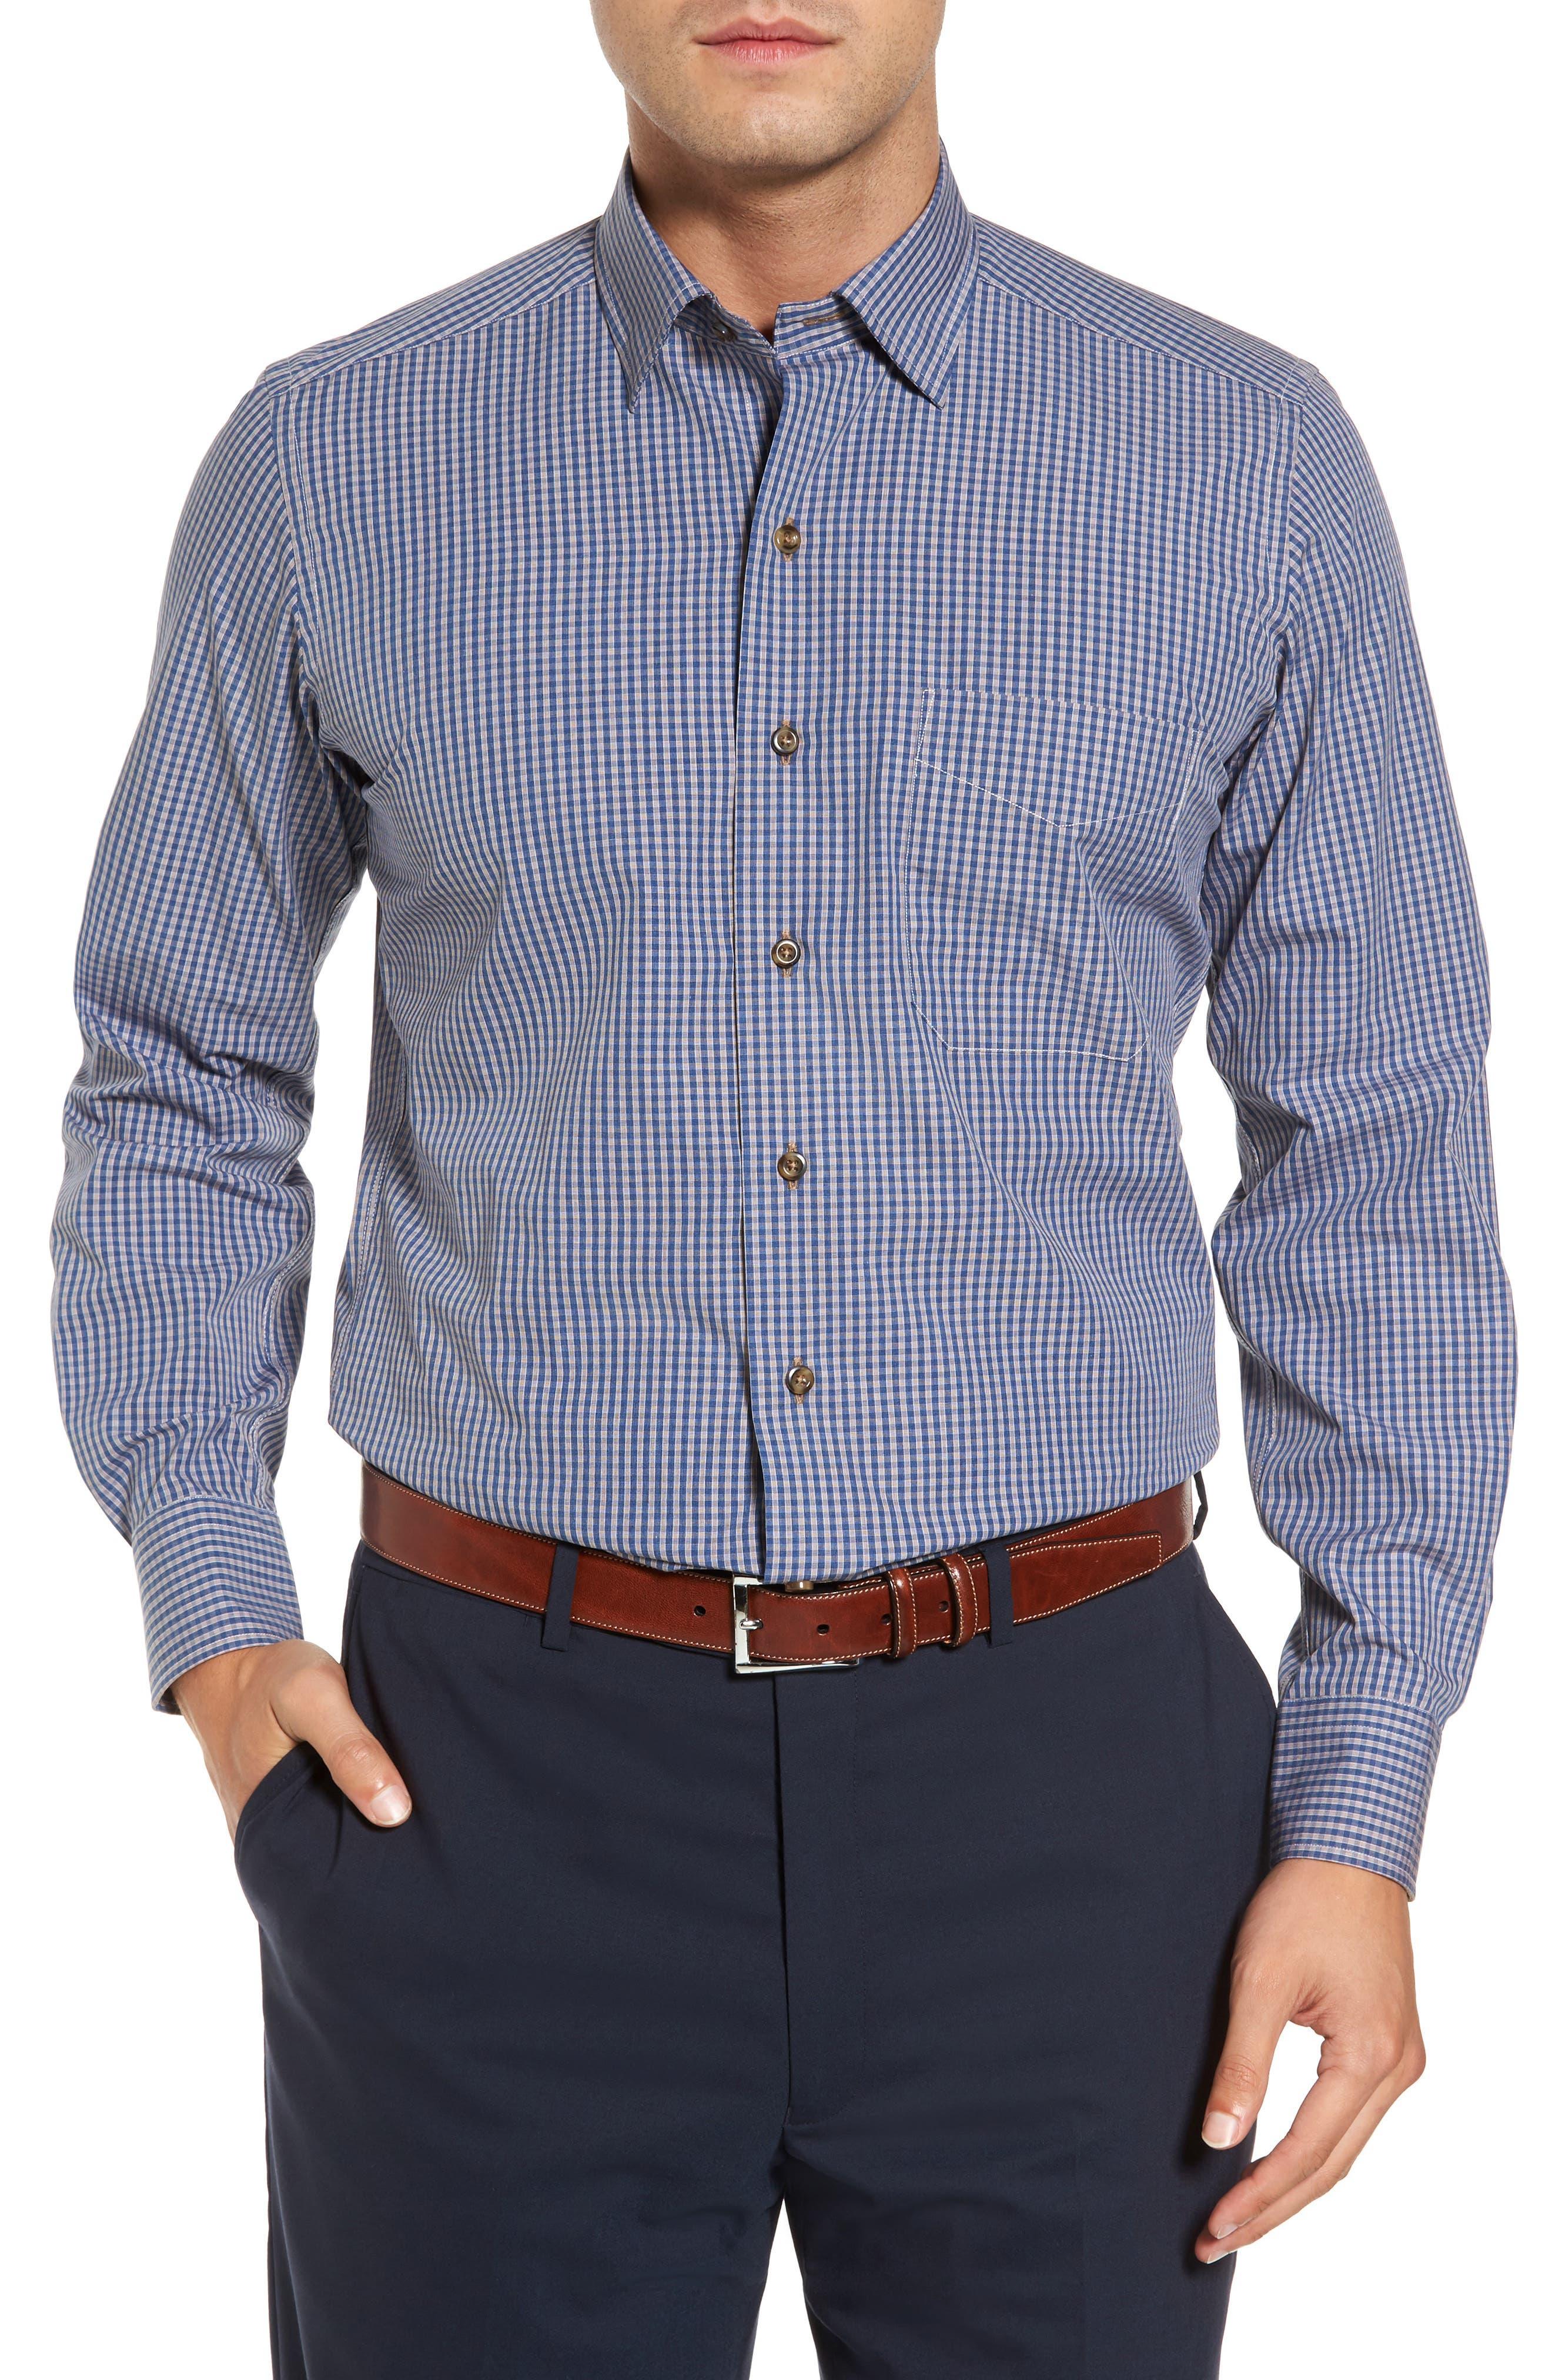 Regular Fit Check Sport Shirt,                             Main thumbnail 1, color,                             Navy/ Chocolate